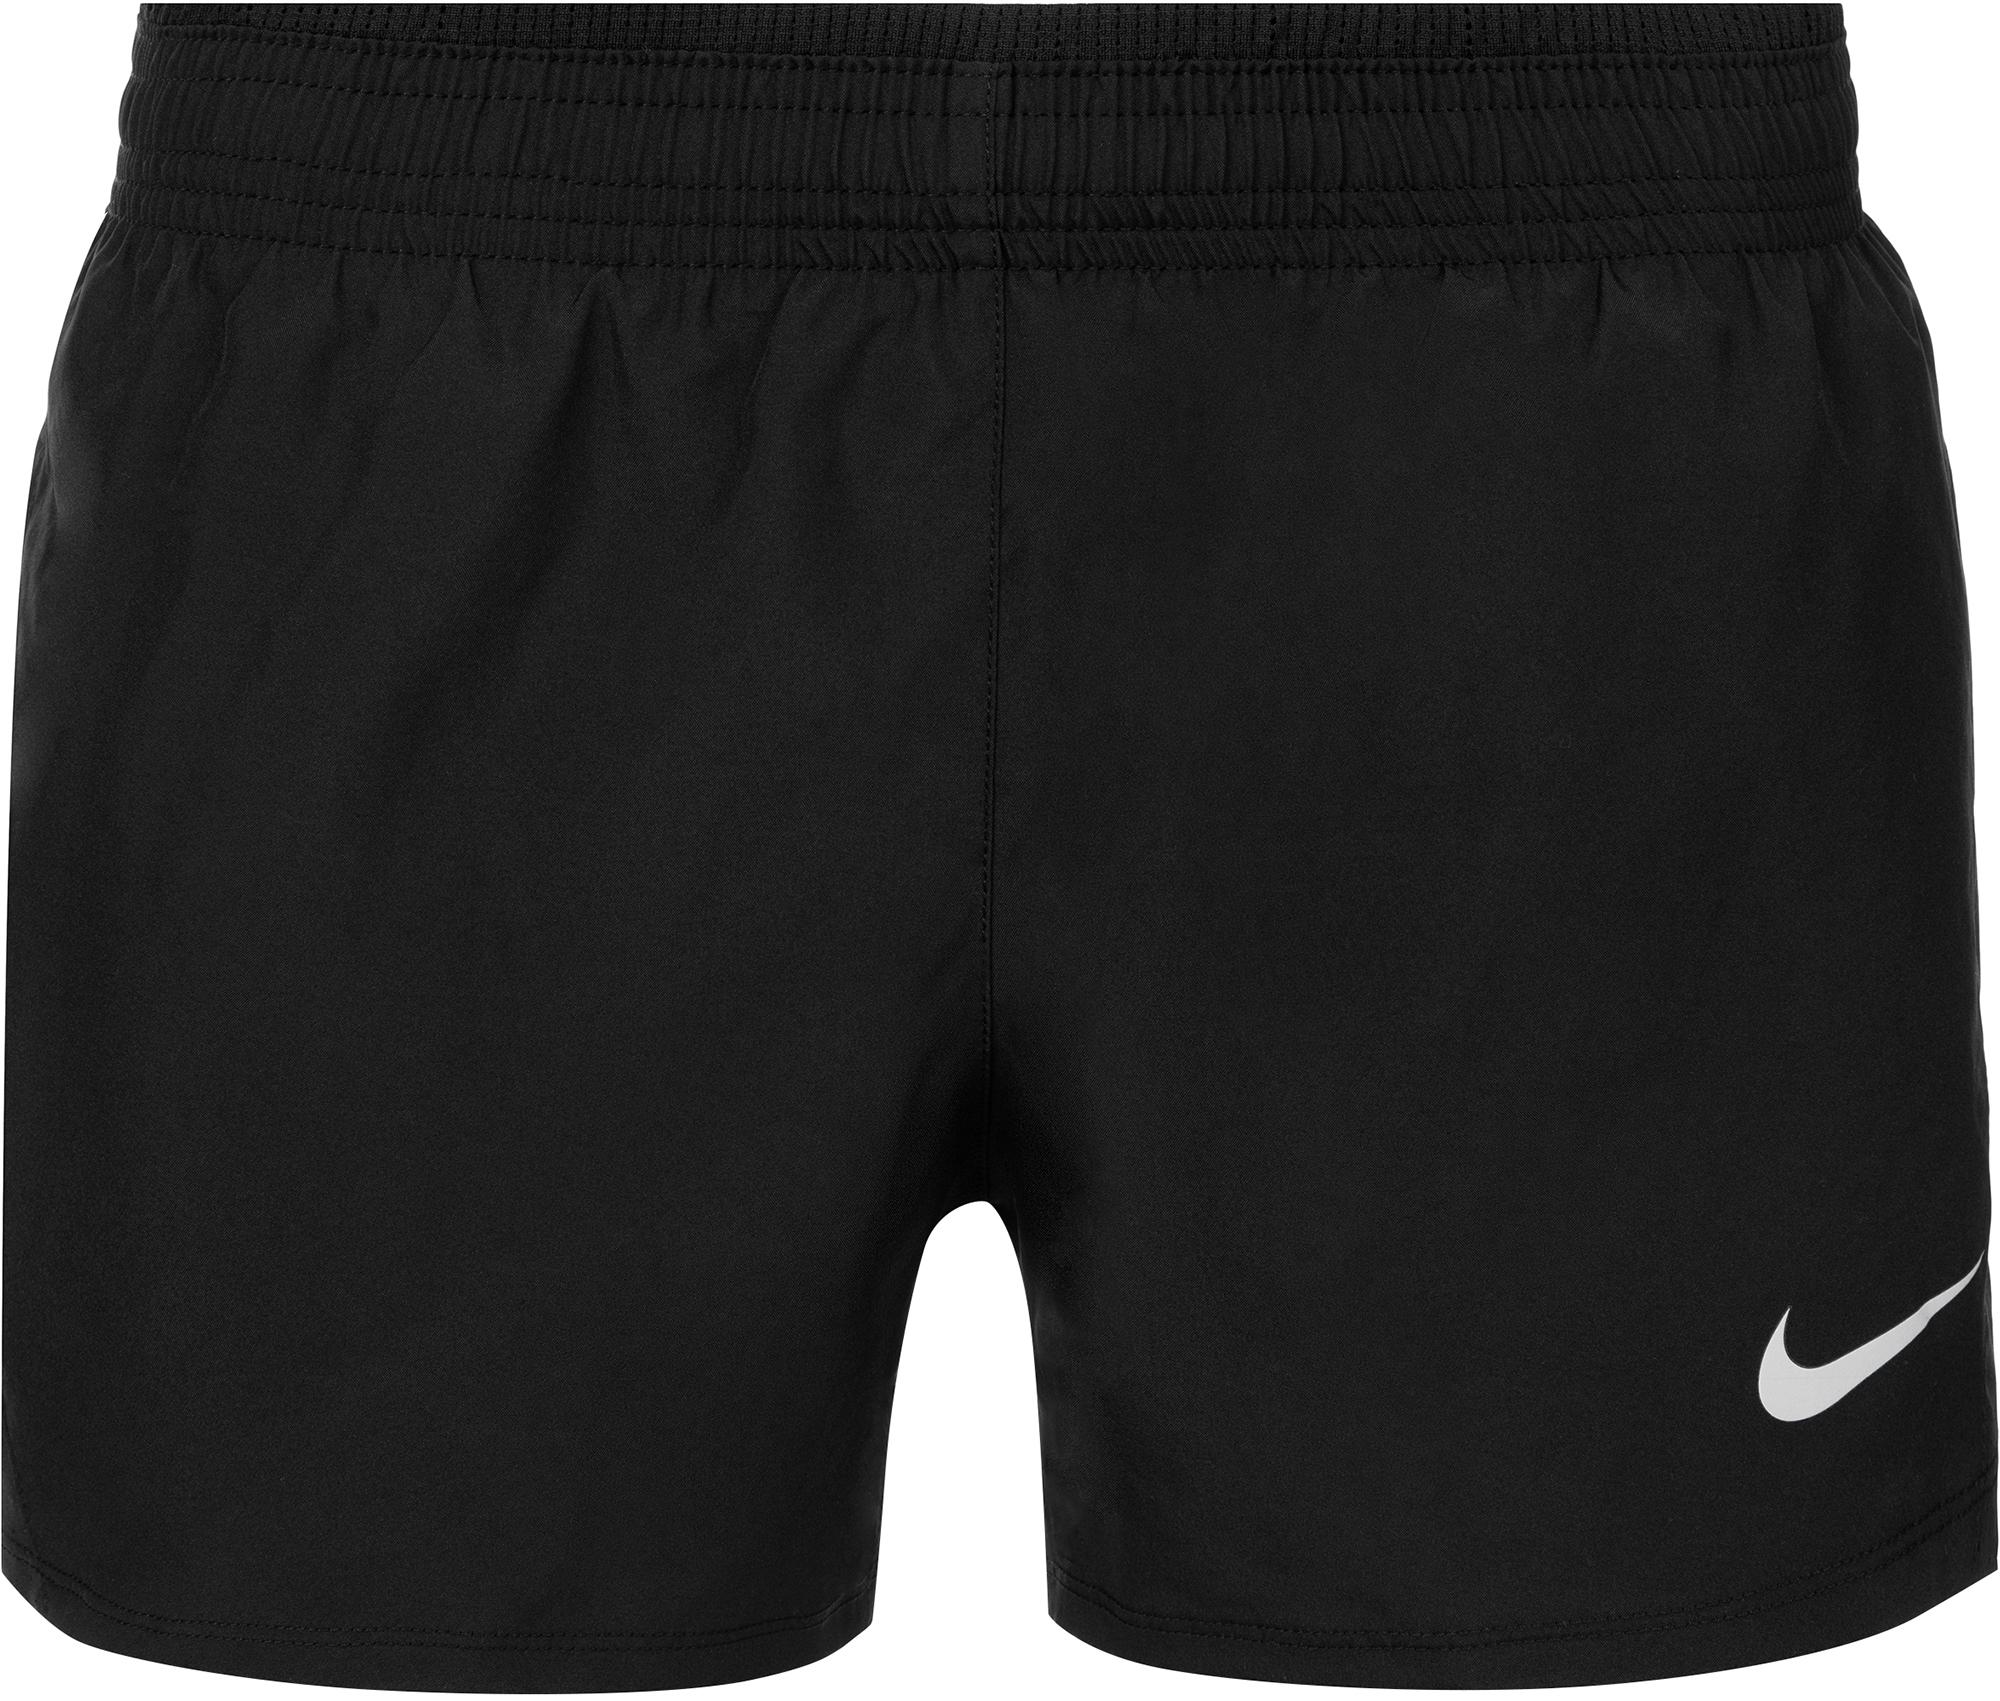 цена на Nike Шорты женские Nike 10K, размер 40-42